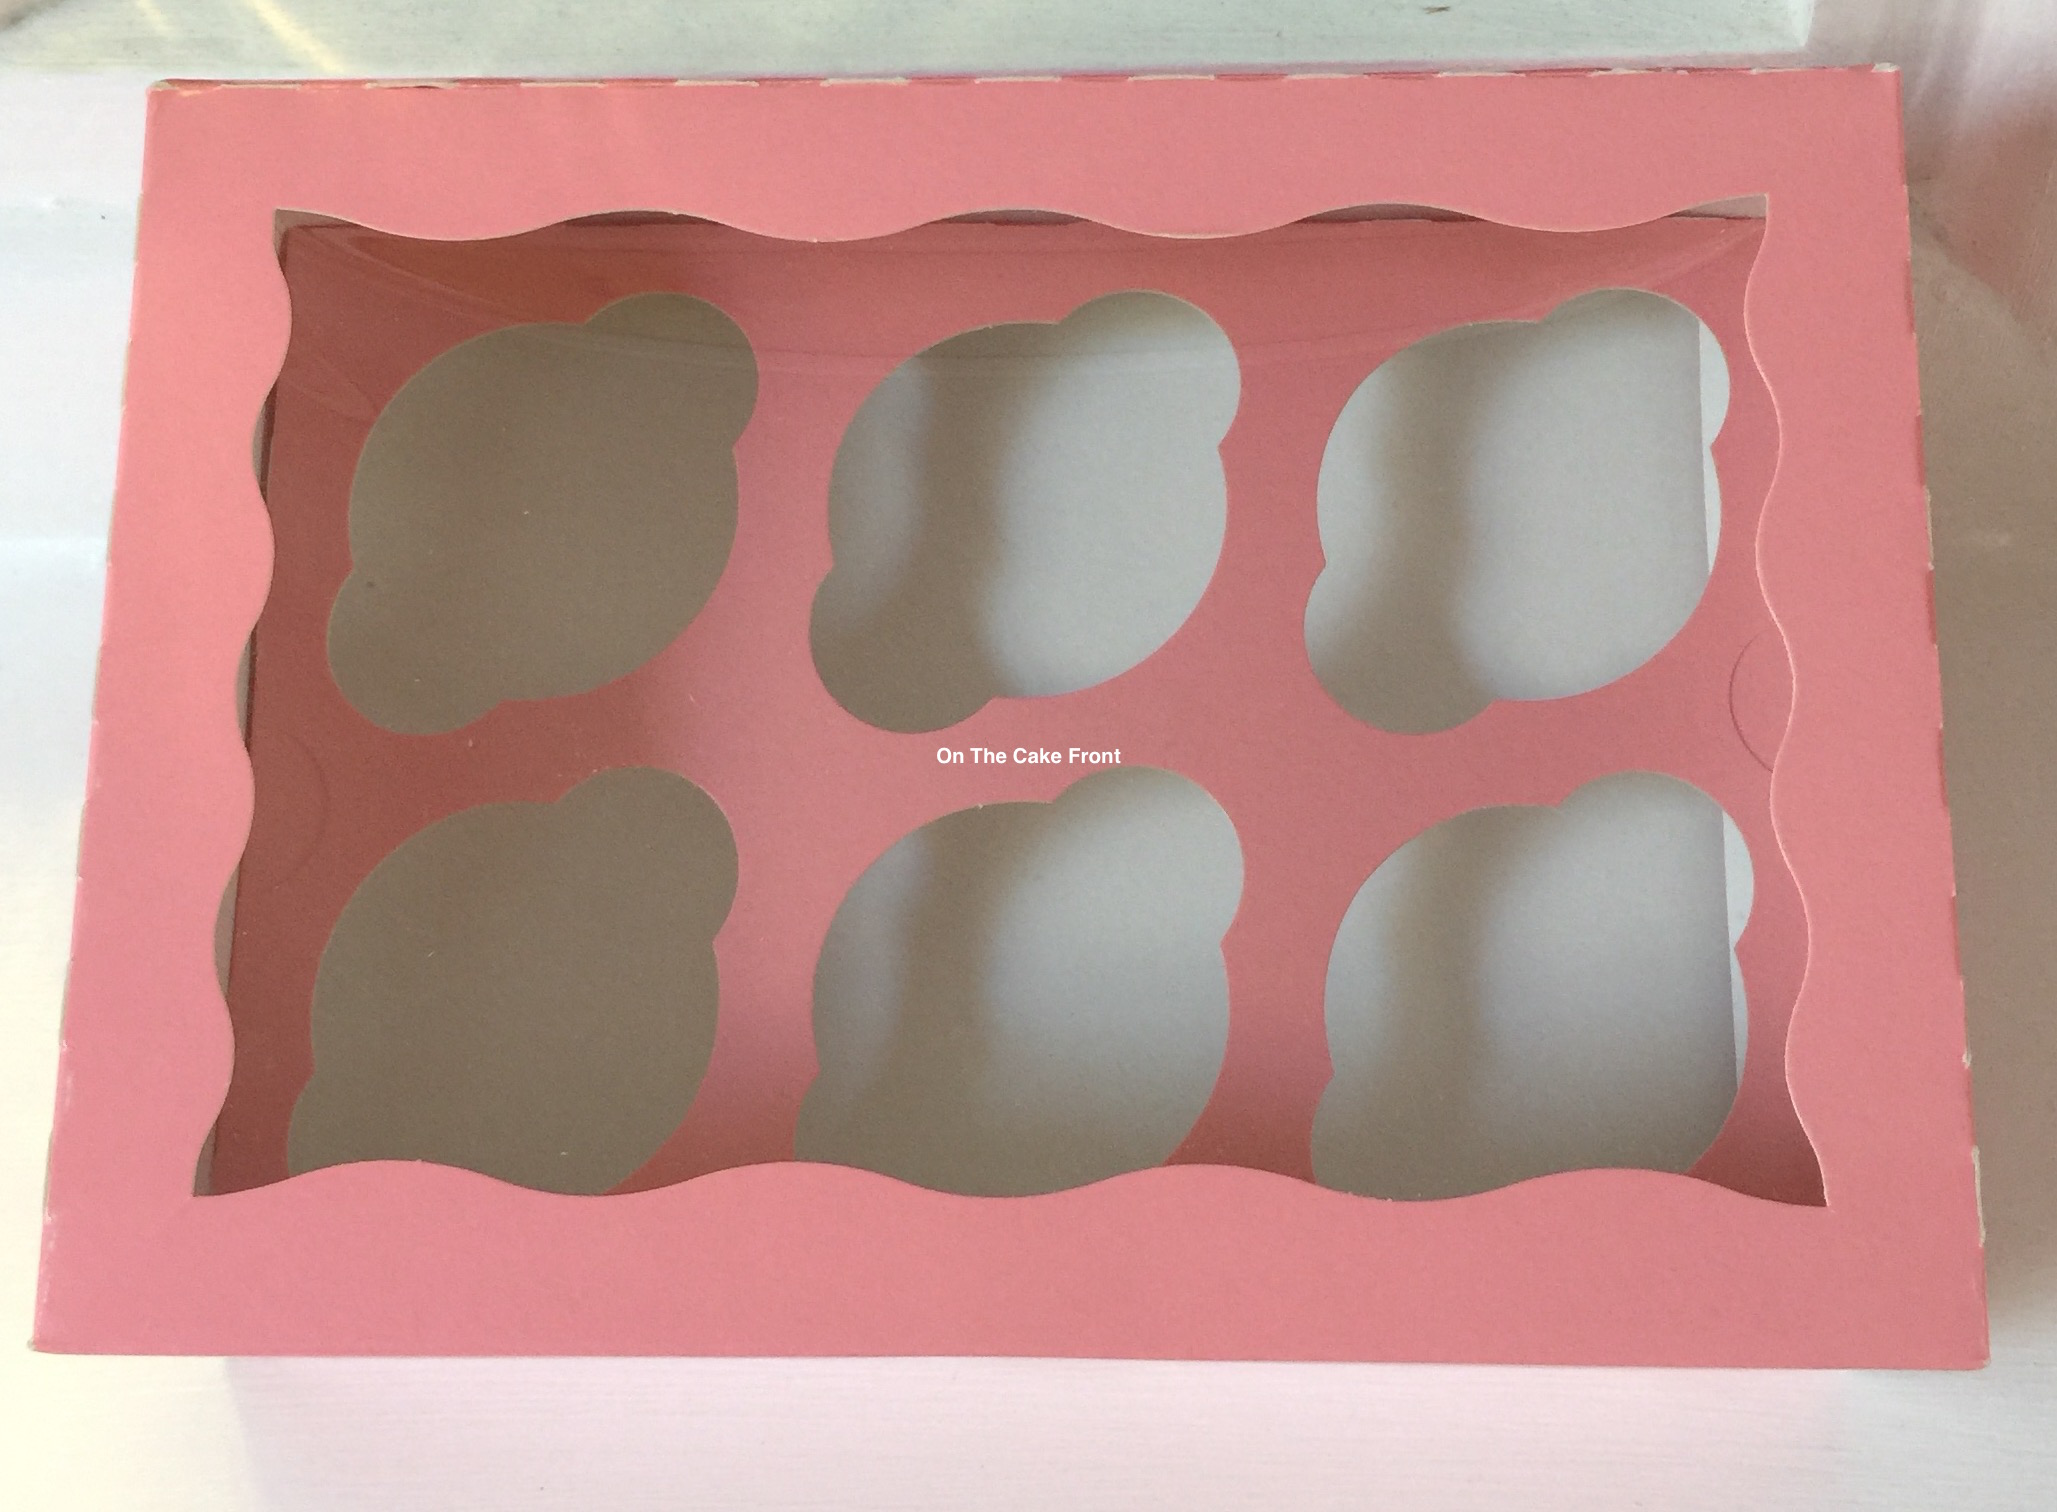 Pink cupcake box holds 6 cakes window insert